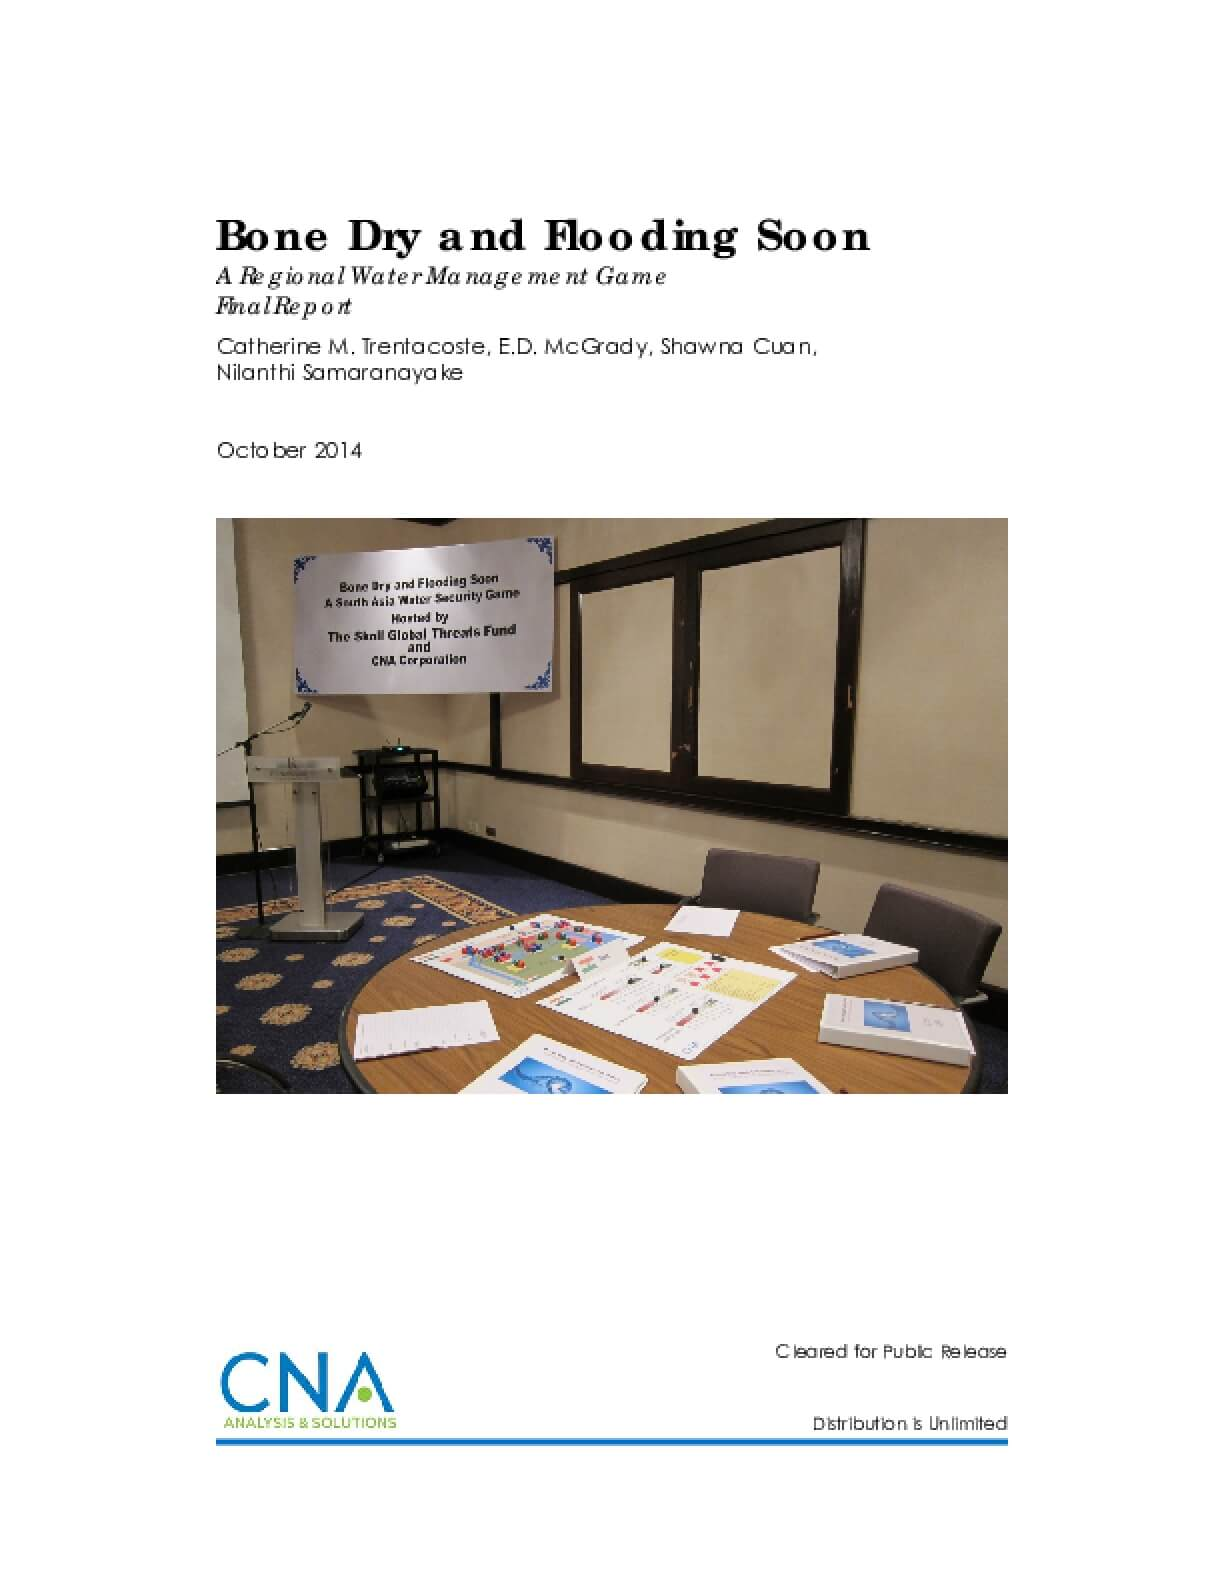 Bone Dry and Flooding Soon